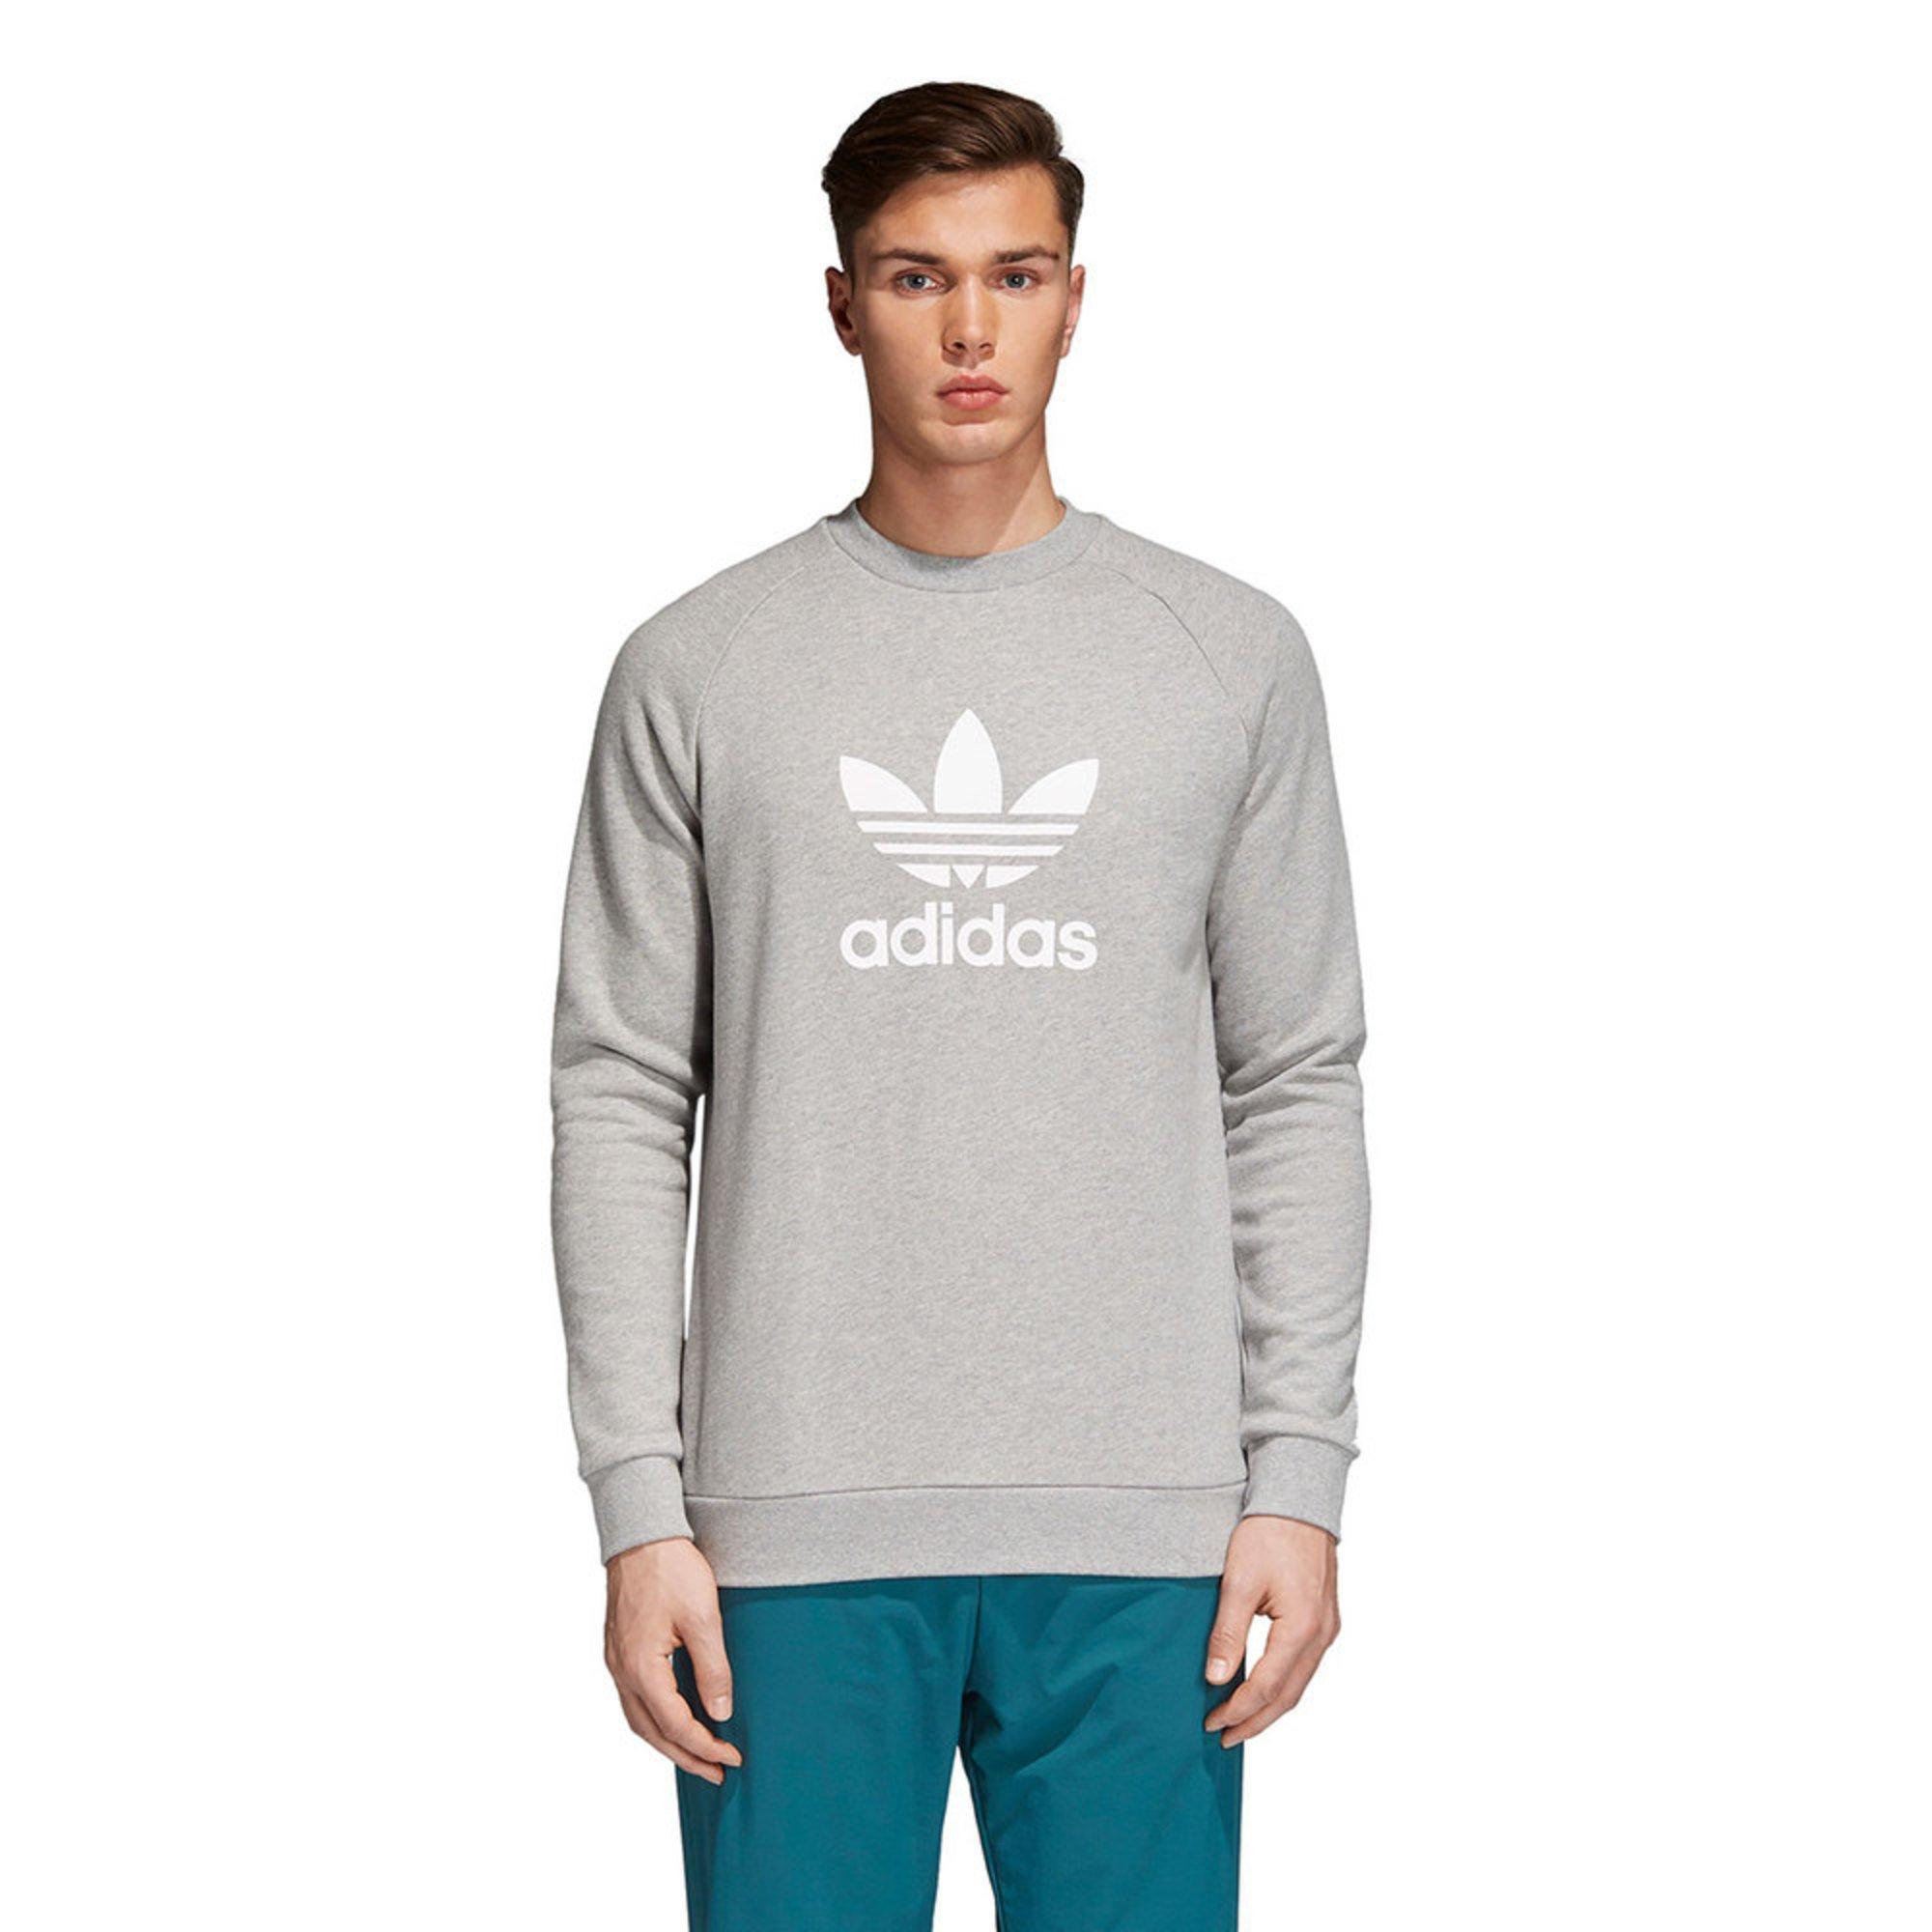 Adidas Men's LS Crew Originals